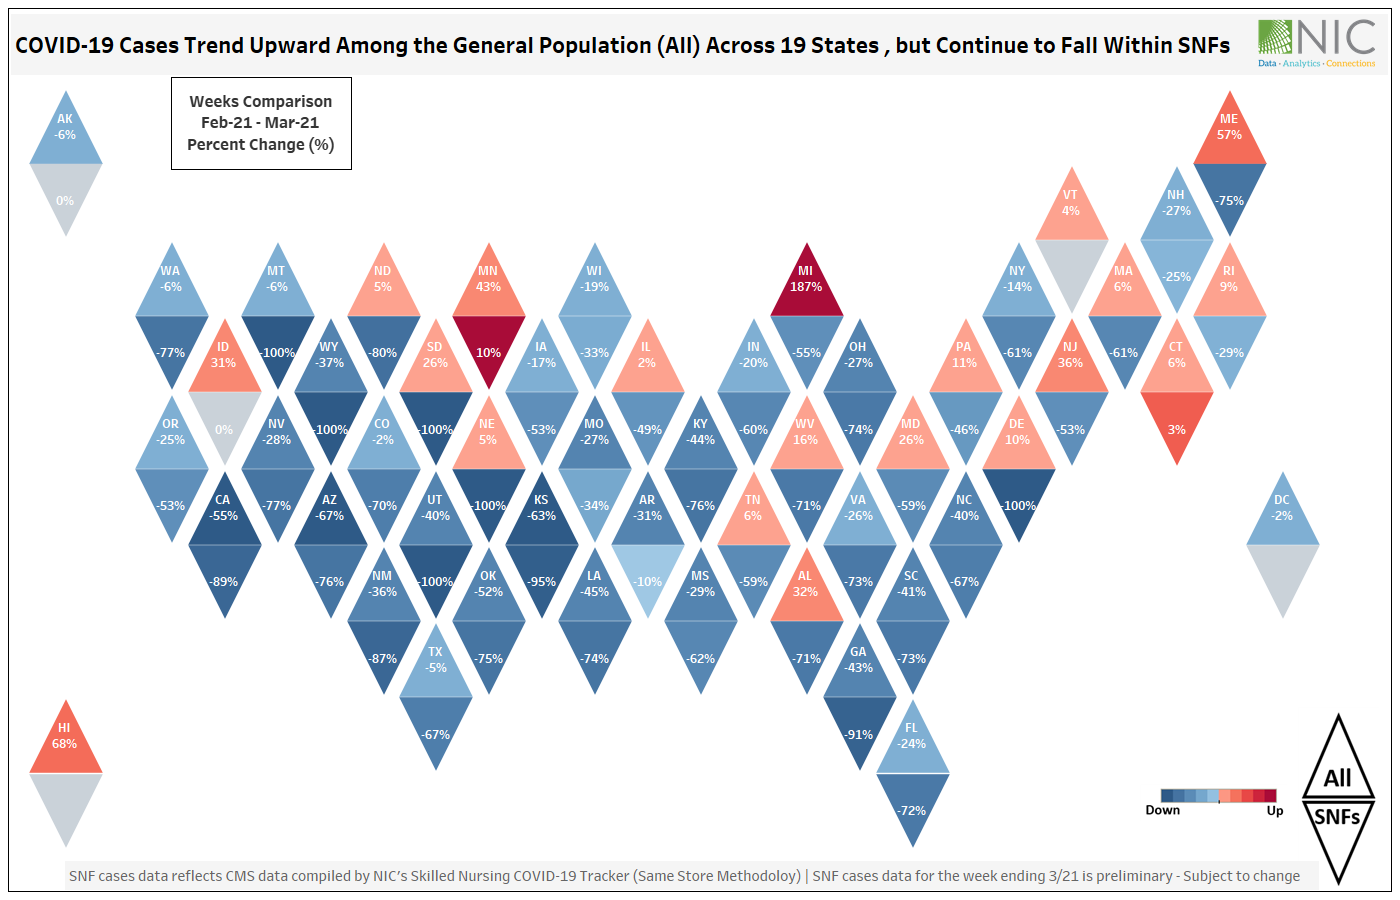 MAP - US vs. SNF COVID cases